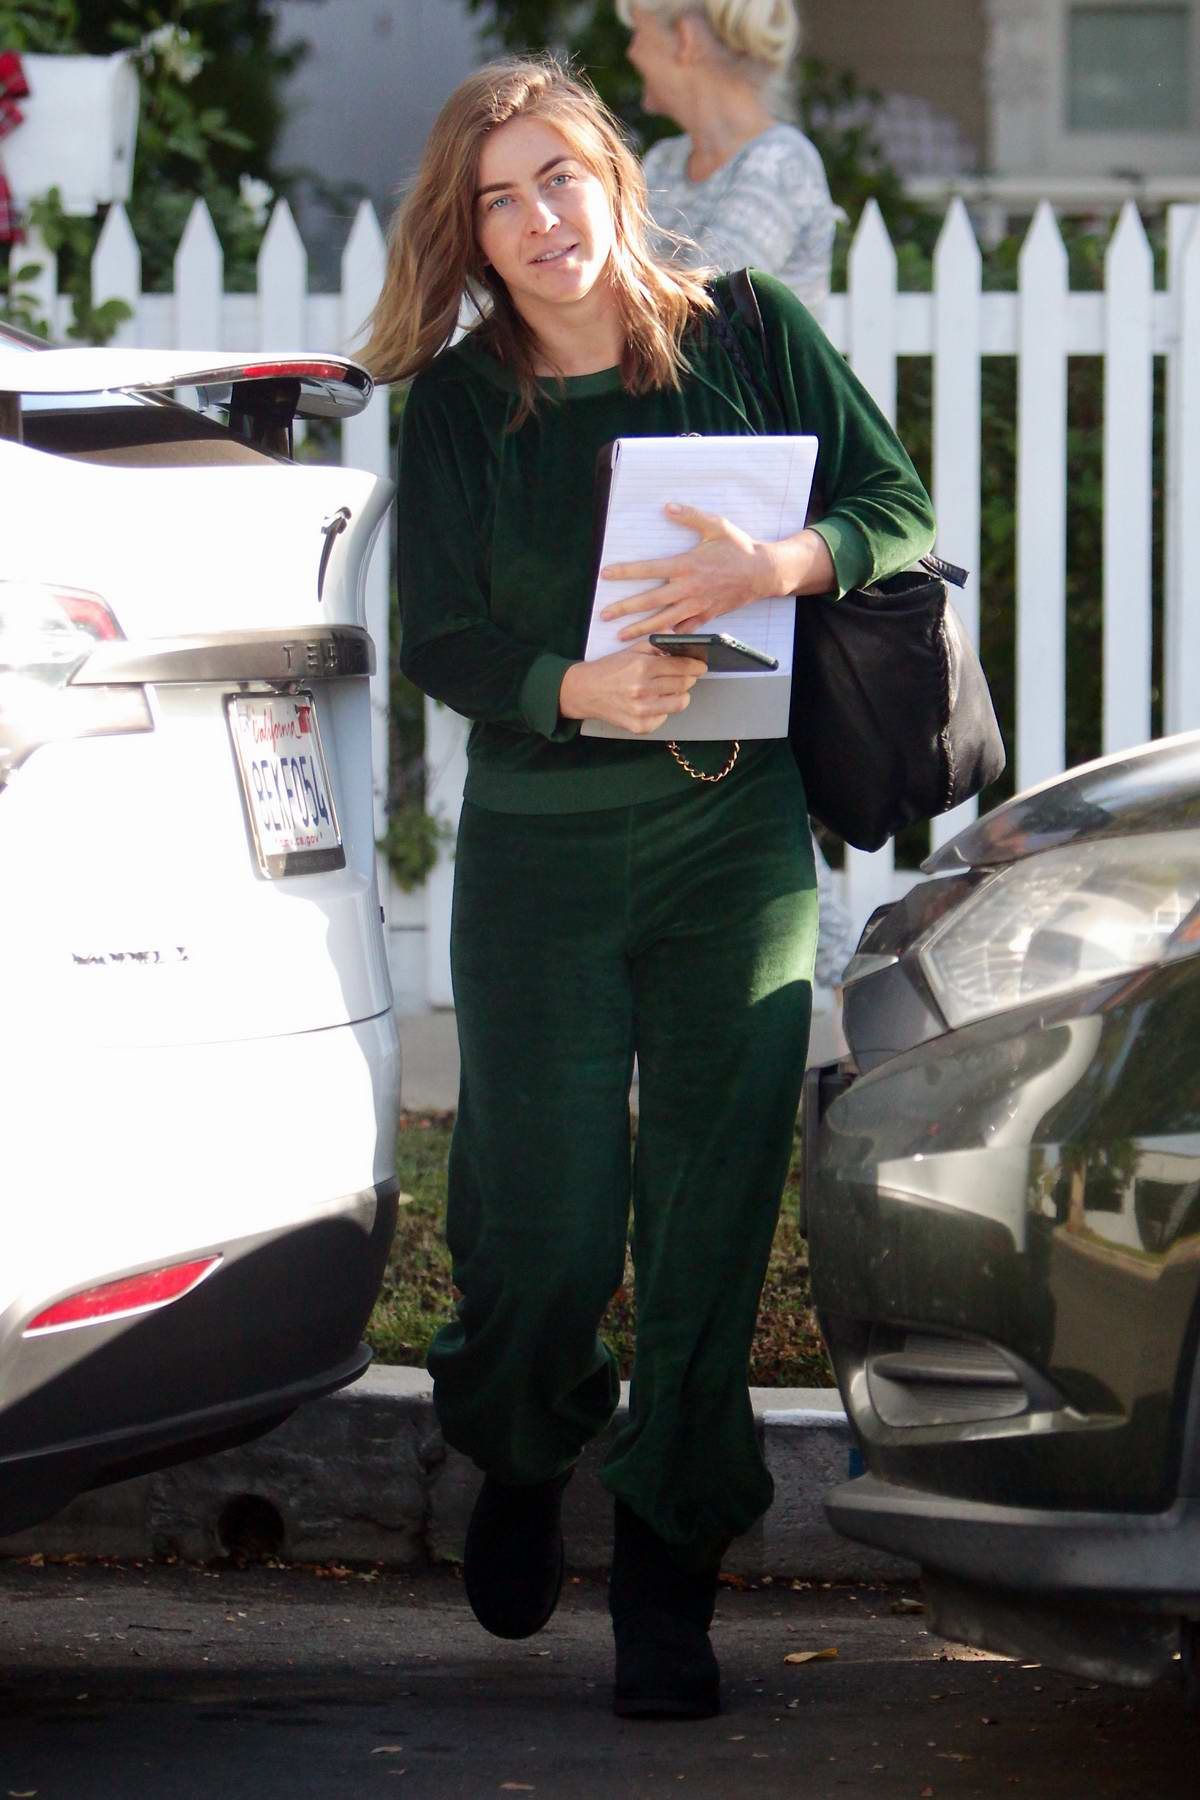 Julianne Hough seen wearing cozy green sweats as she leaves her mother's house in Studio City, California